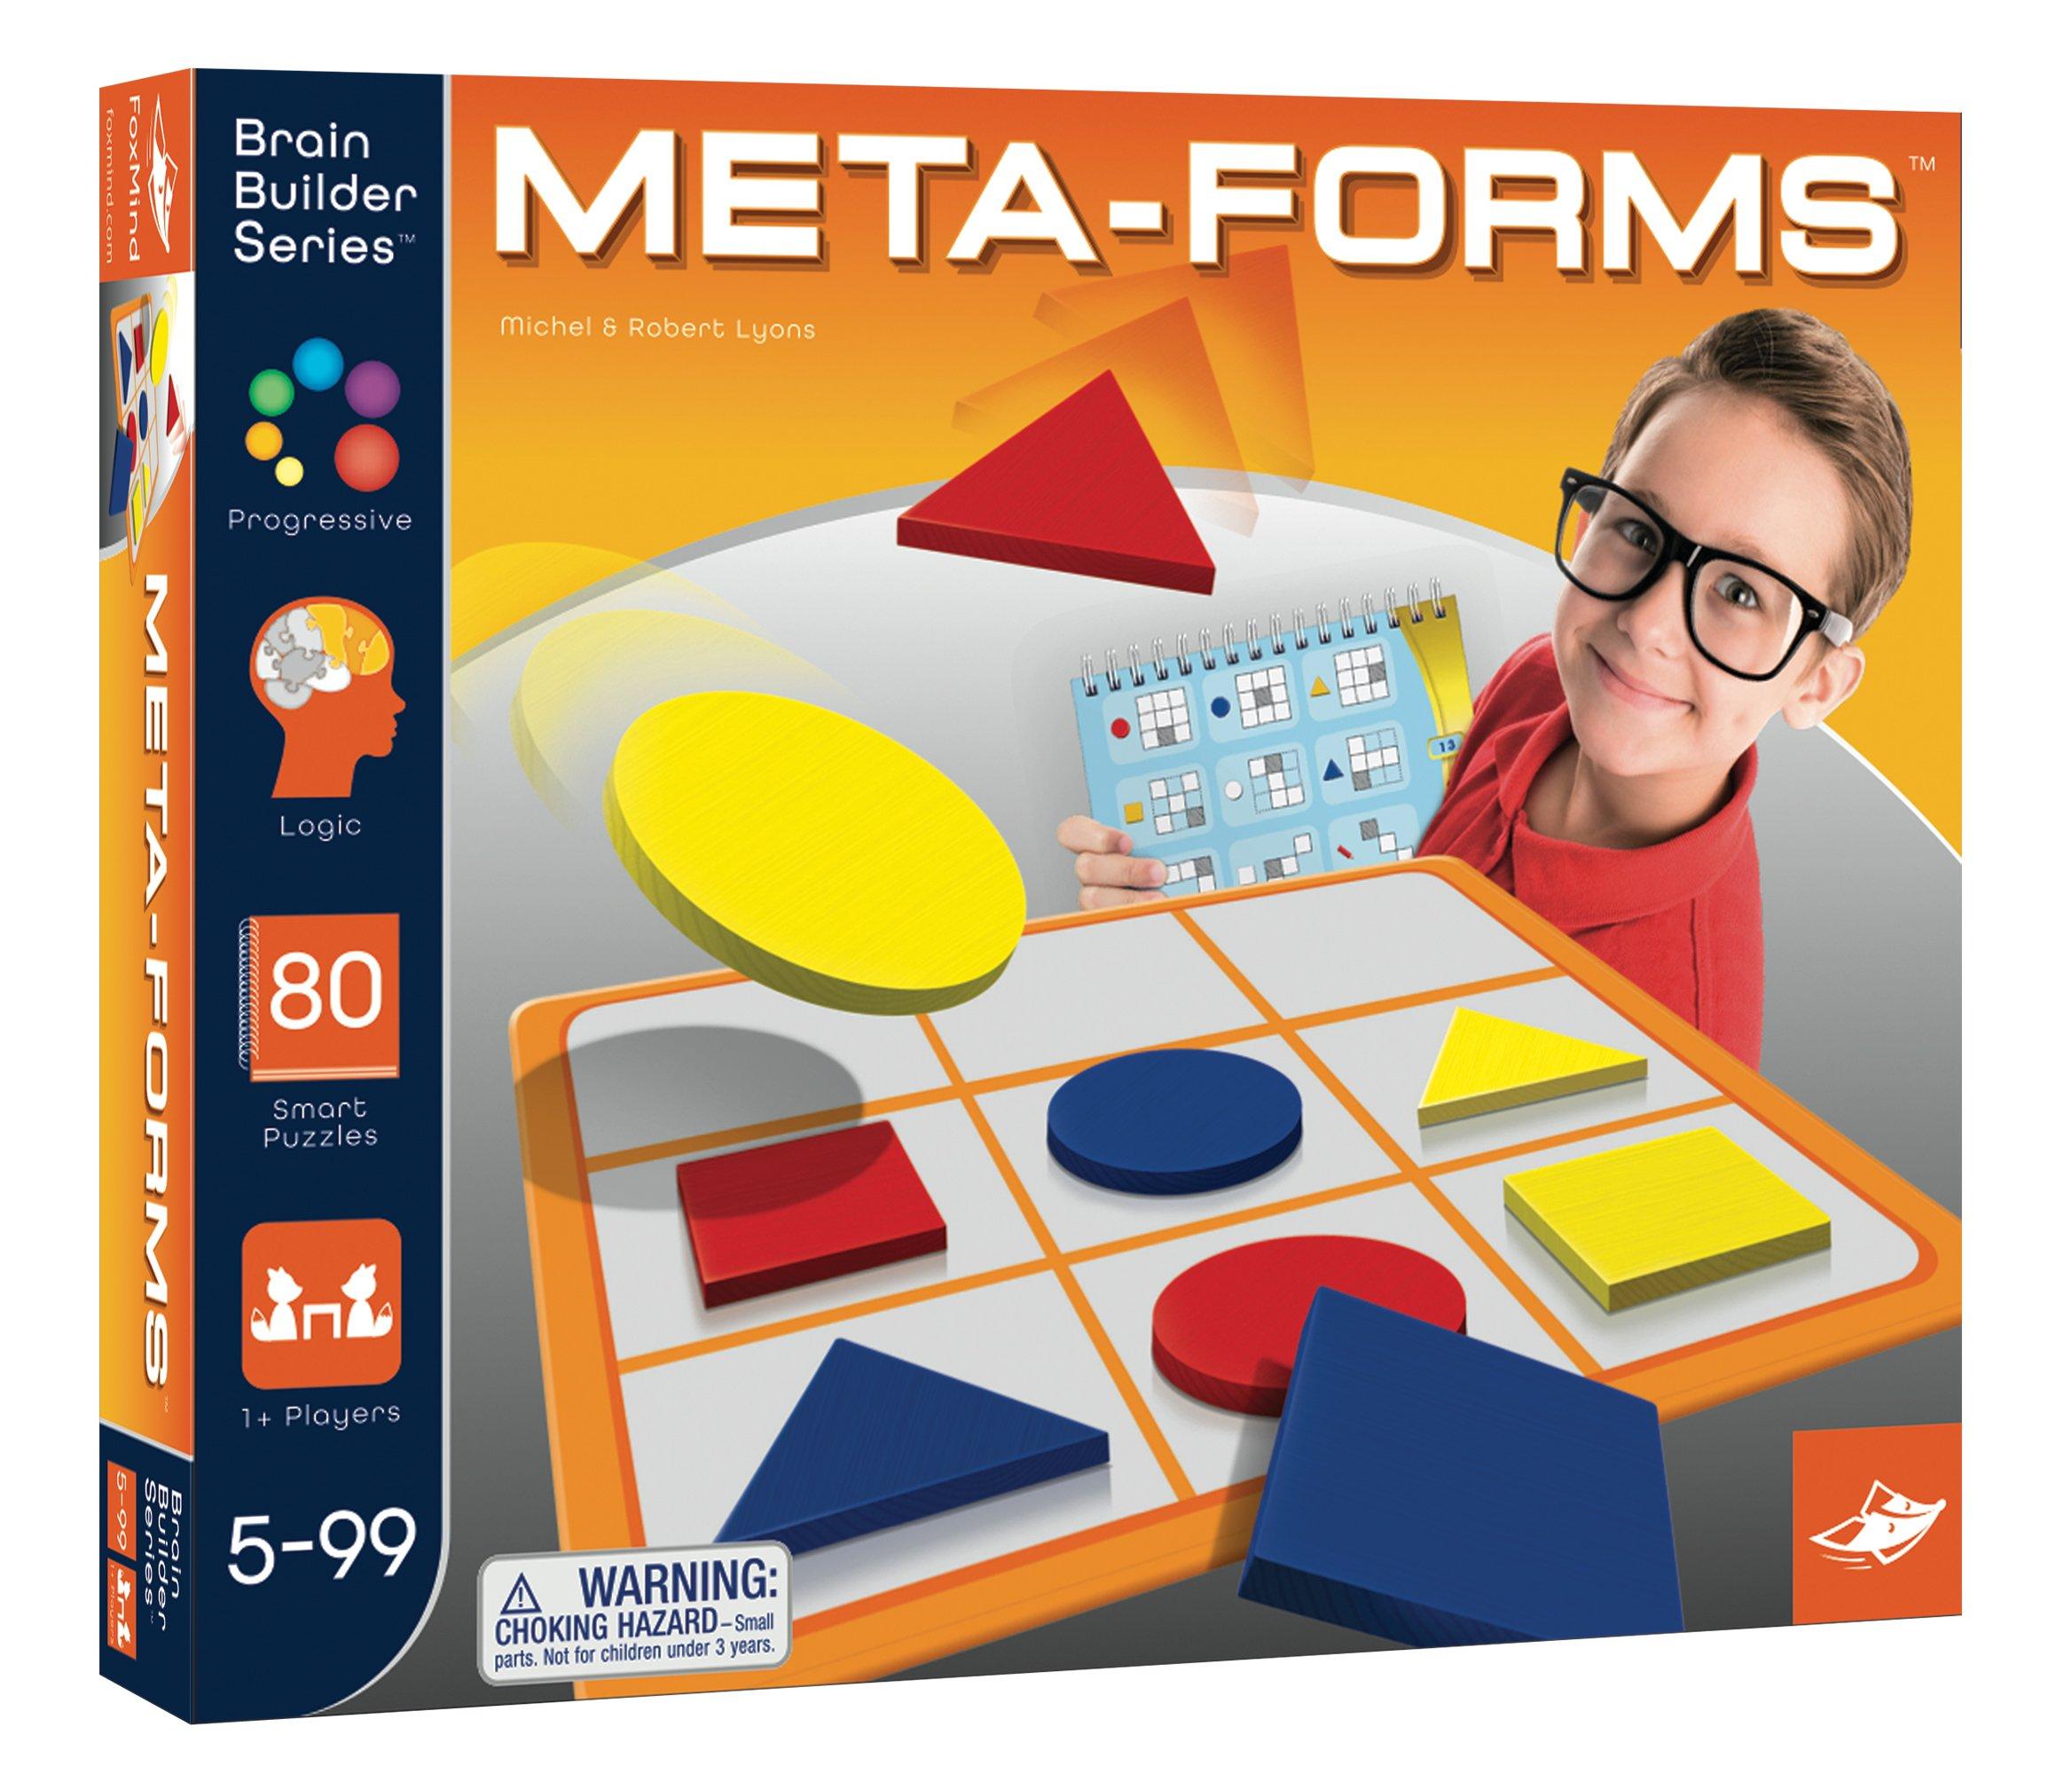 FoxMind Metaforms